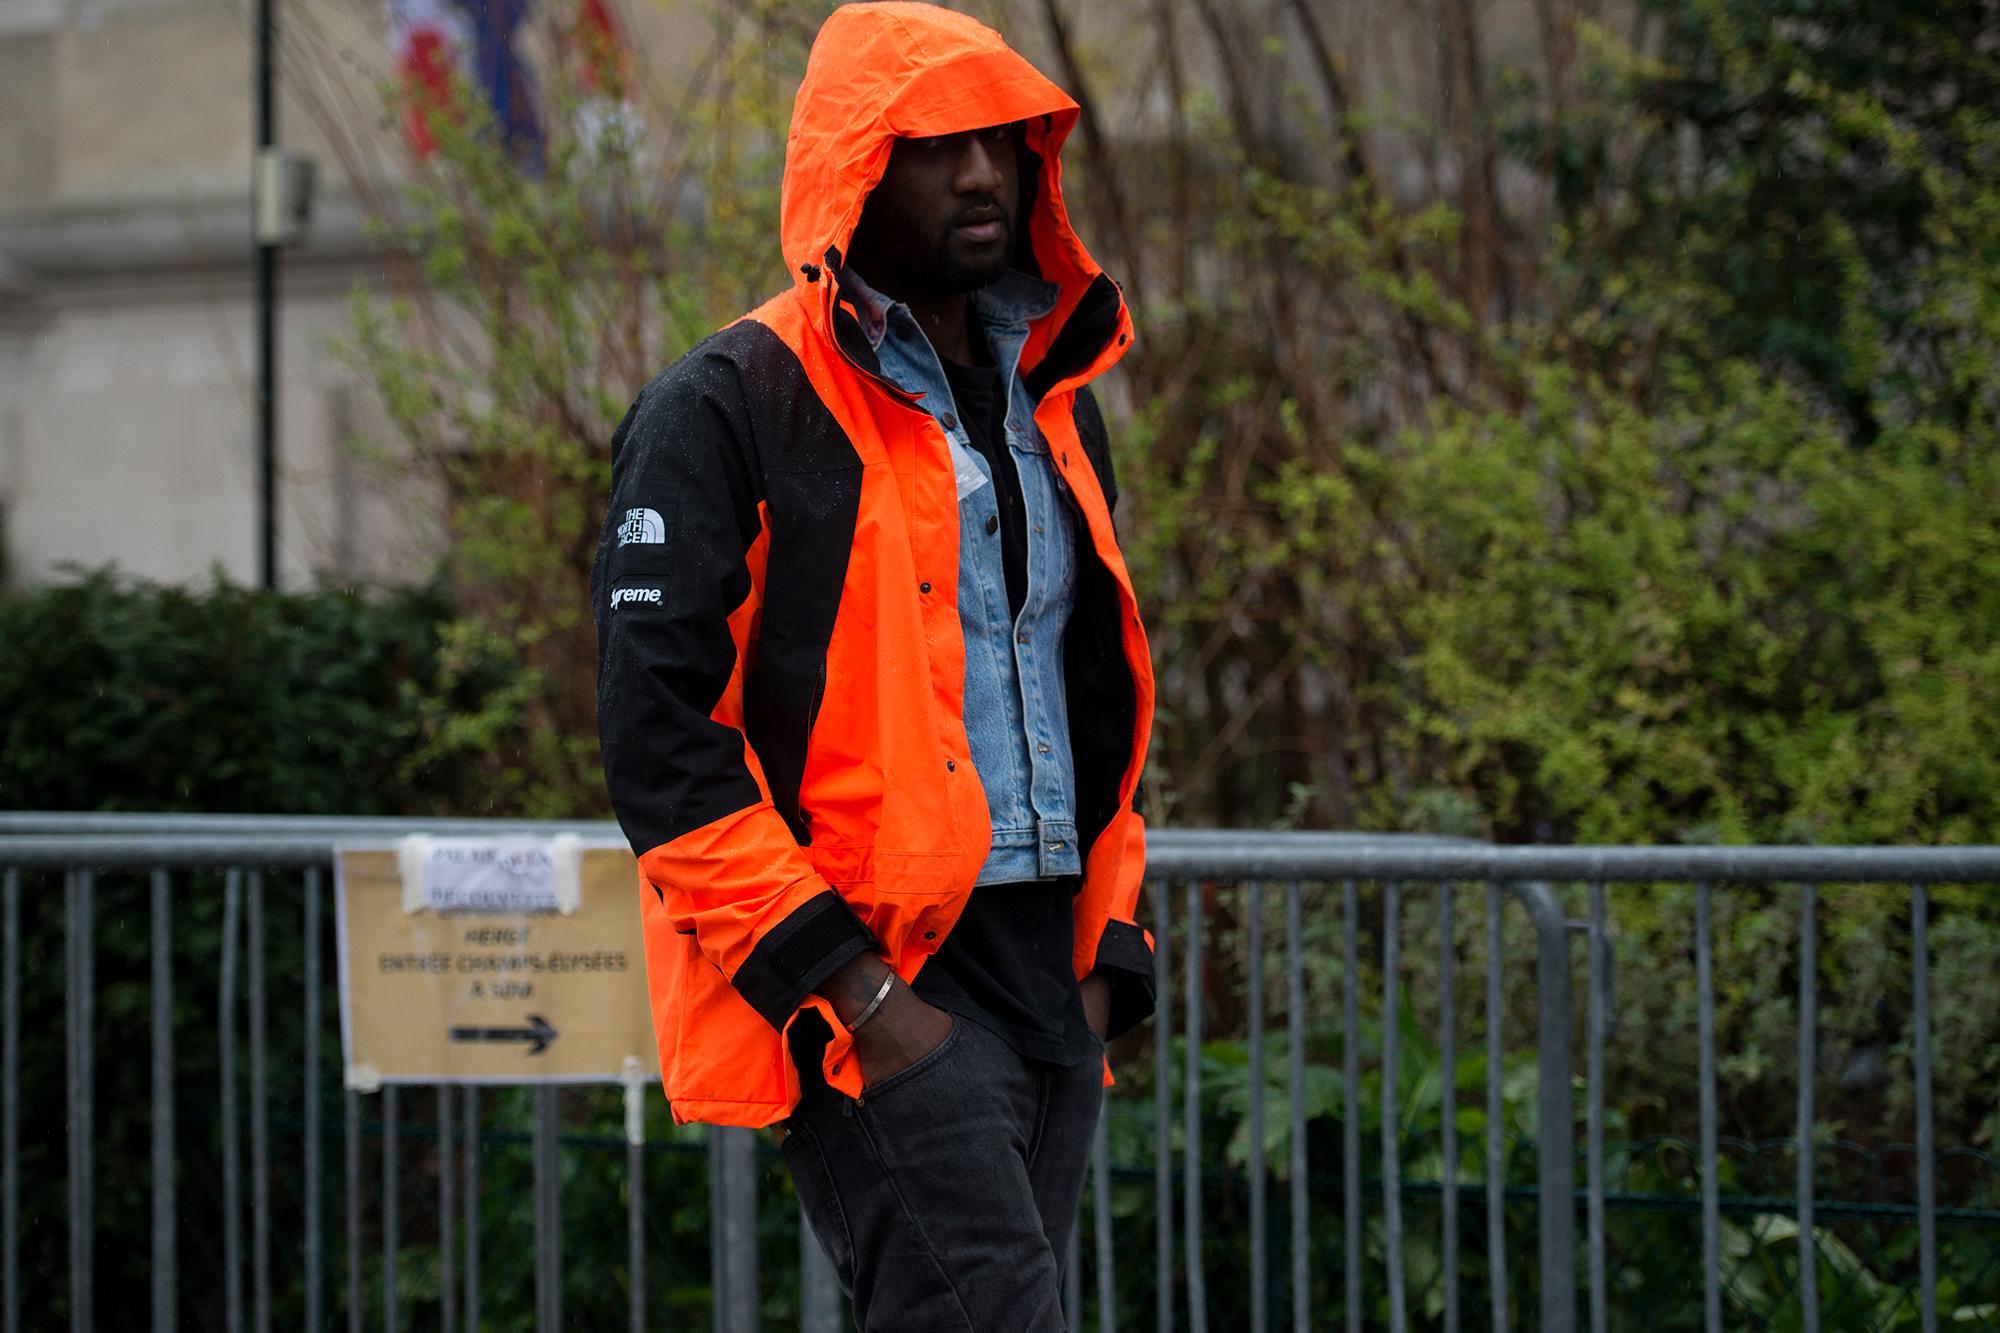 Streetsnaps Paris Fashion Week March 2017 Part 2 - 3747921